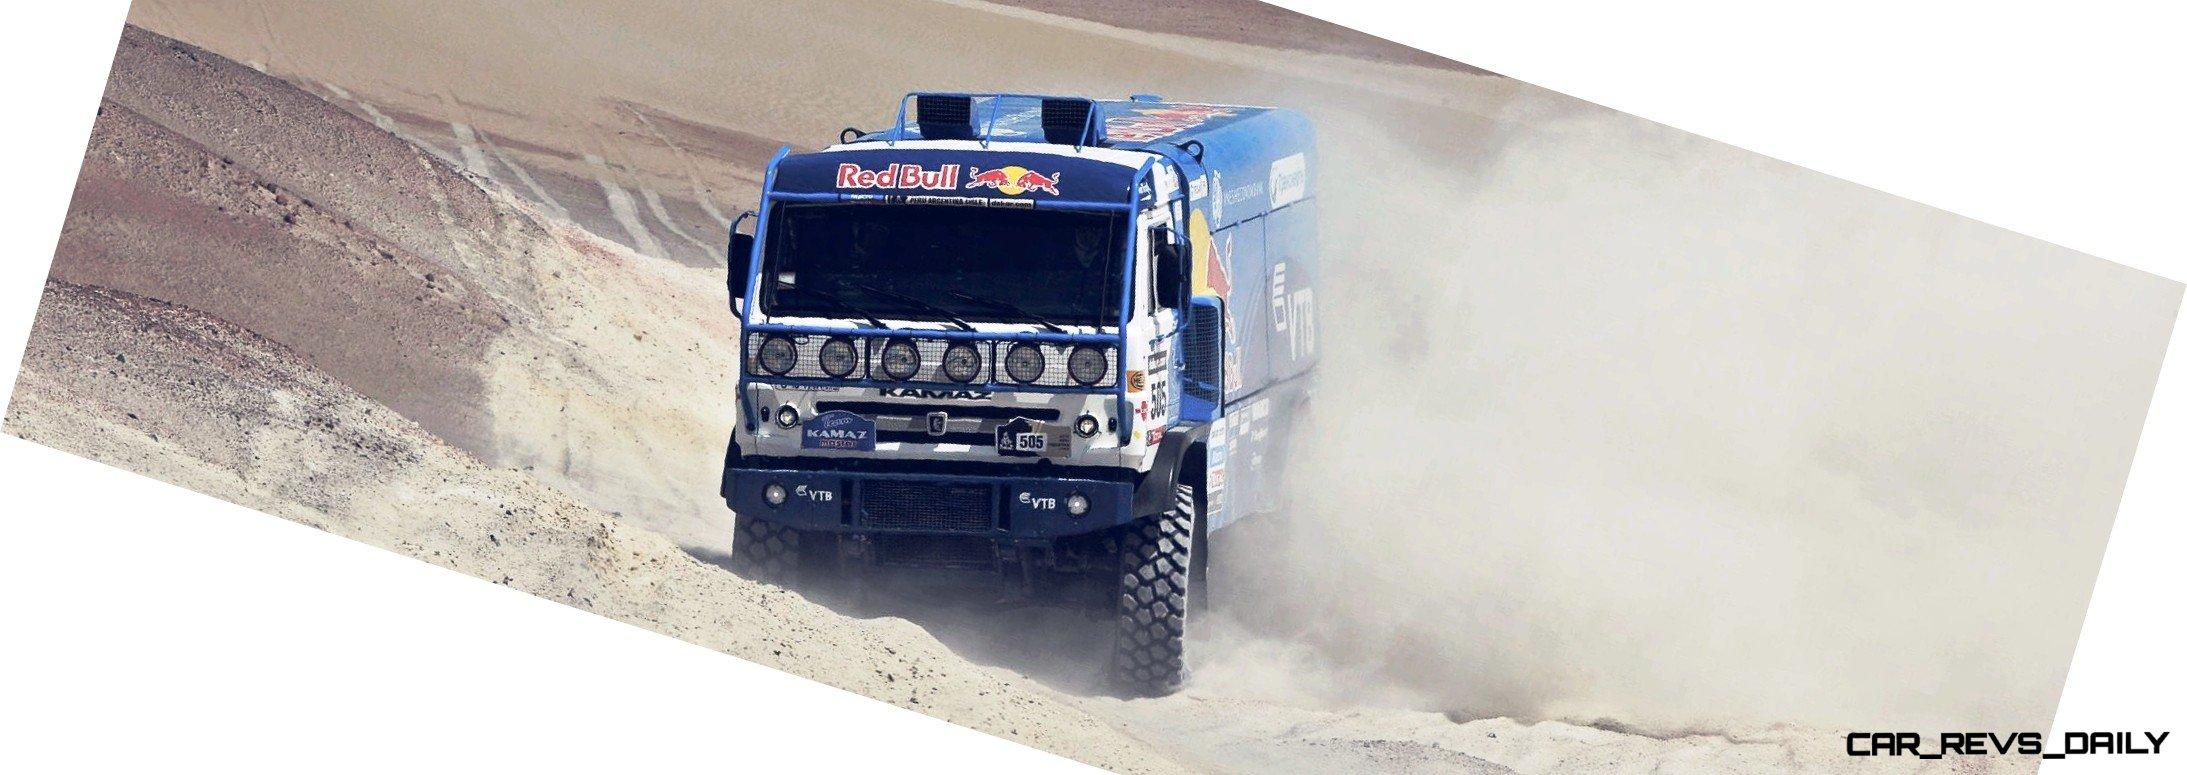 Unimog Nemesis - Red Bull KAMAZ 4911 - Dakar T4 Hero  12